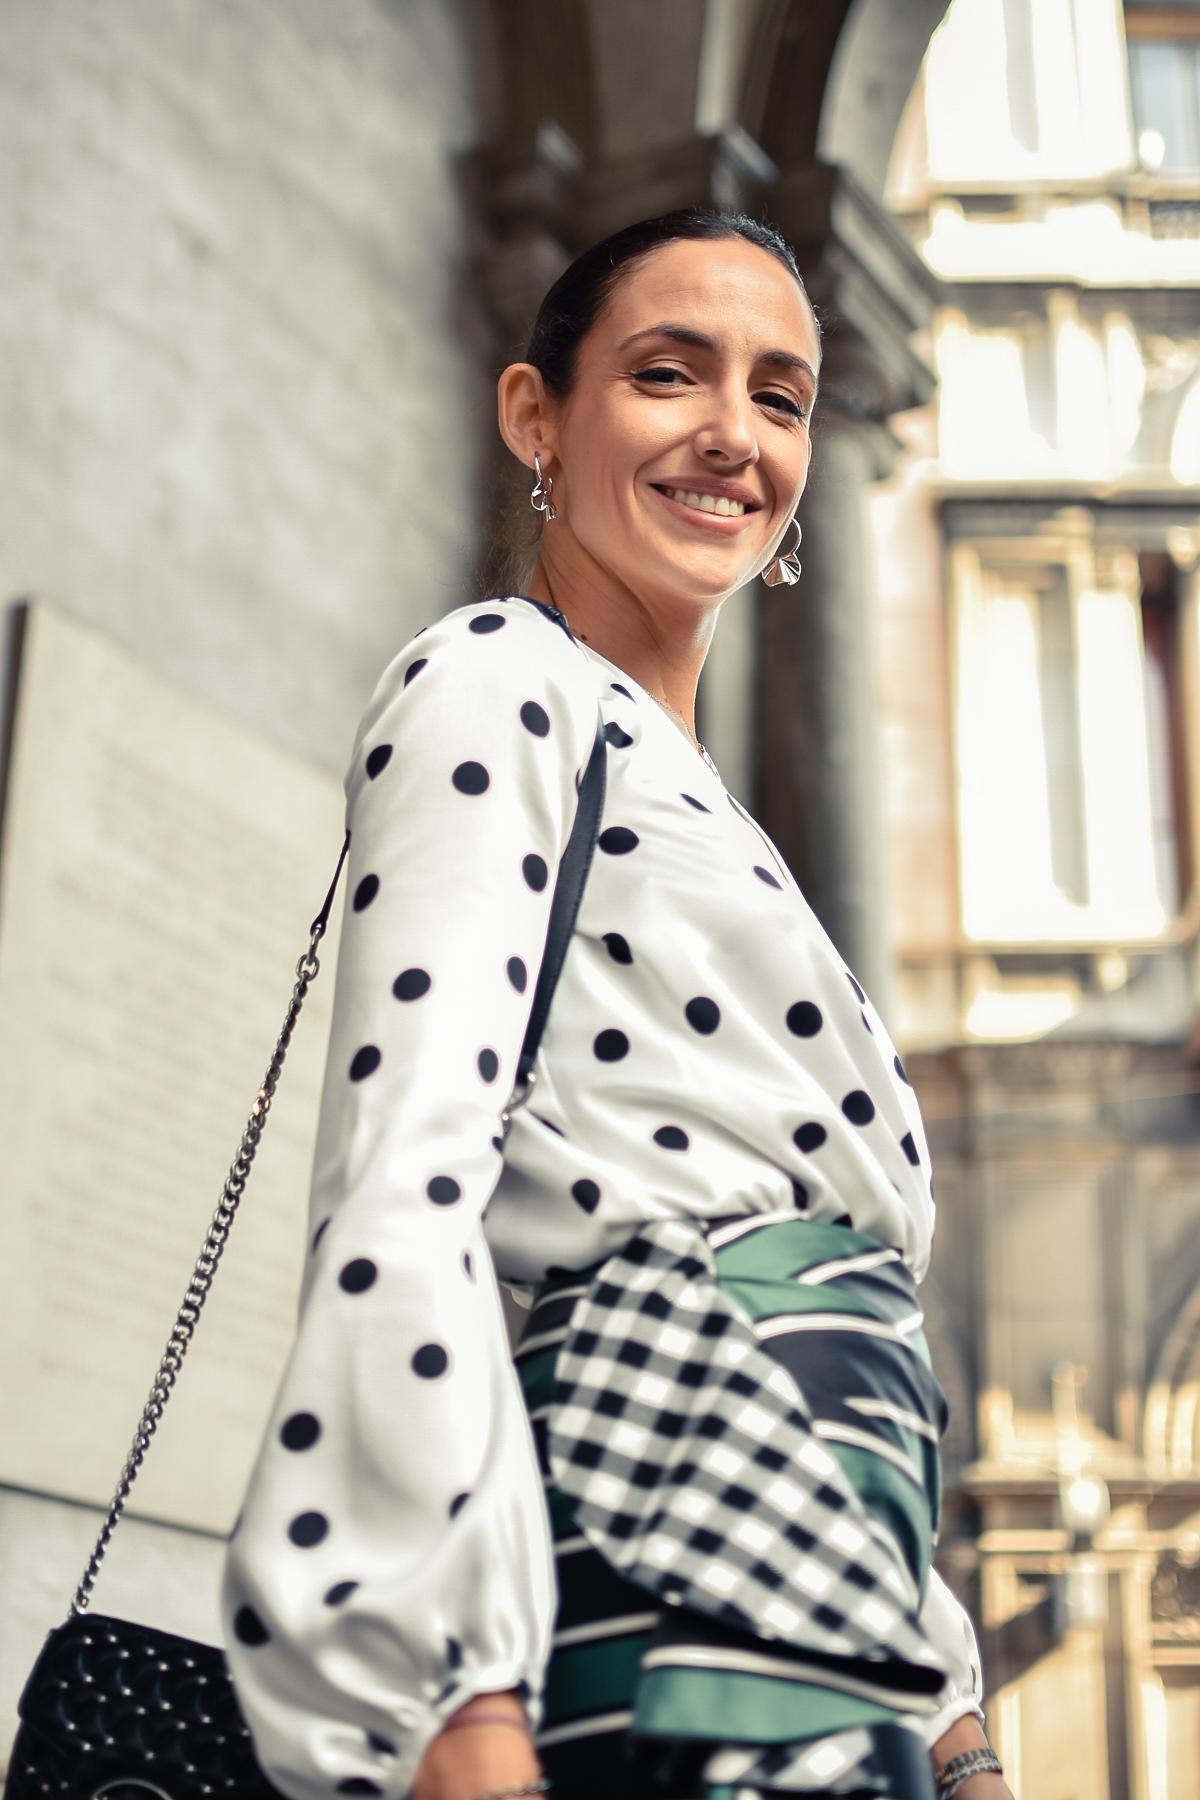 el-blog-de-silvia-mfw-milan-fashion-week-street-style-falda-rayas-manolo-blahnik-05